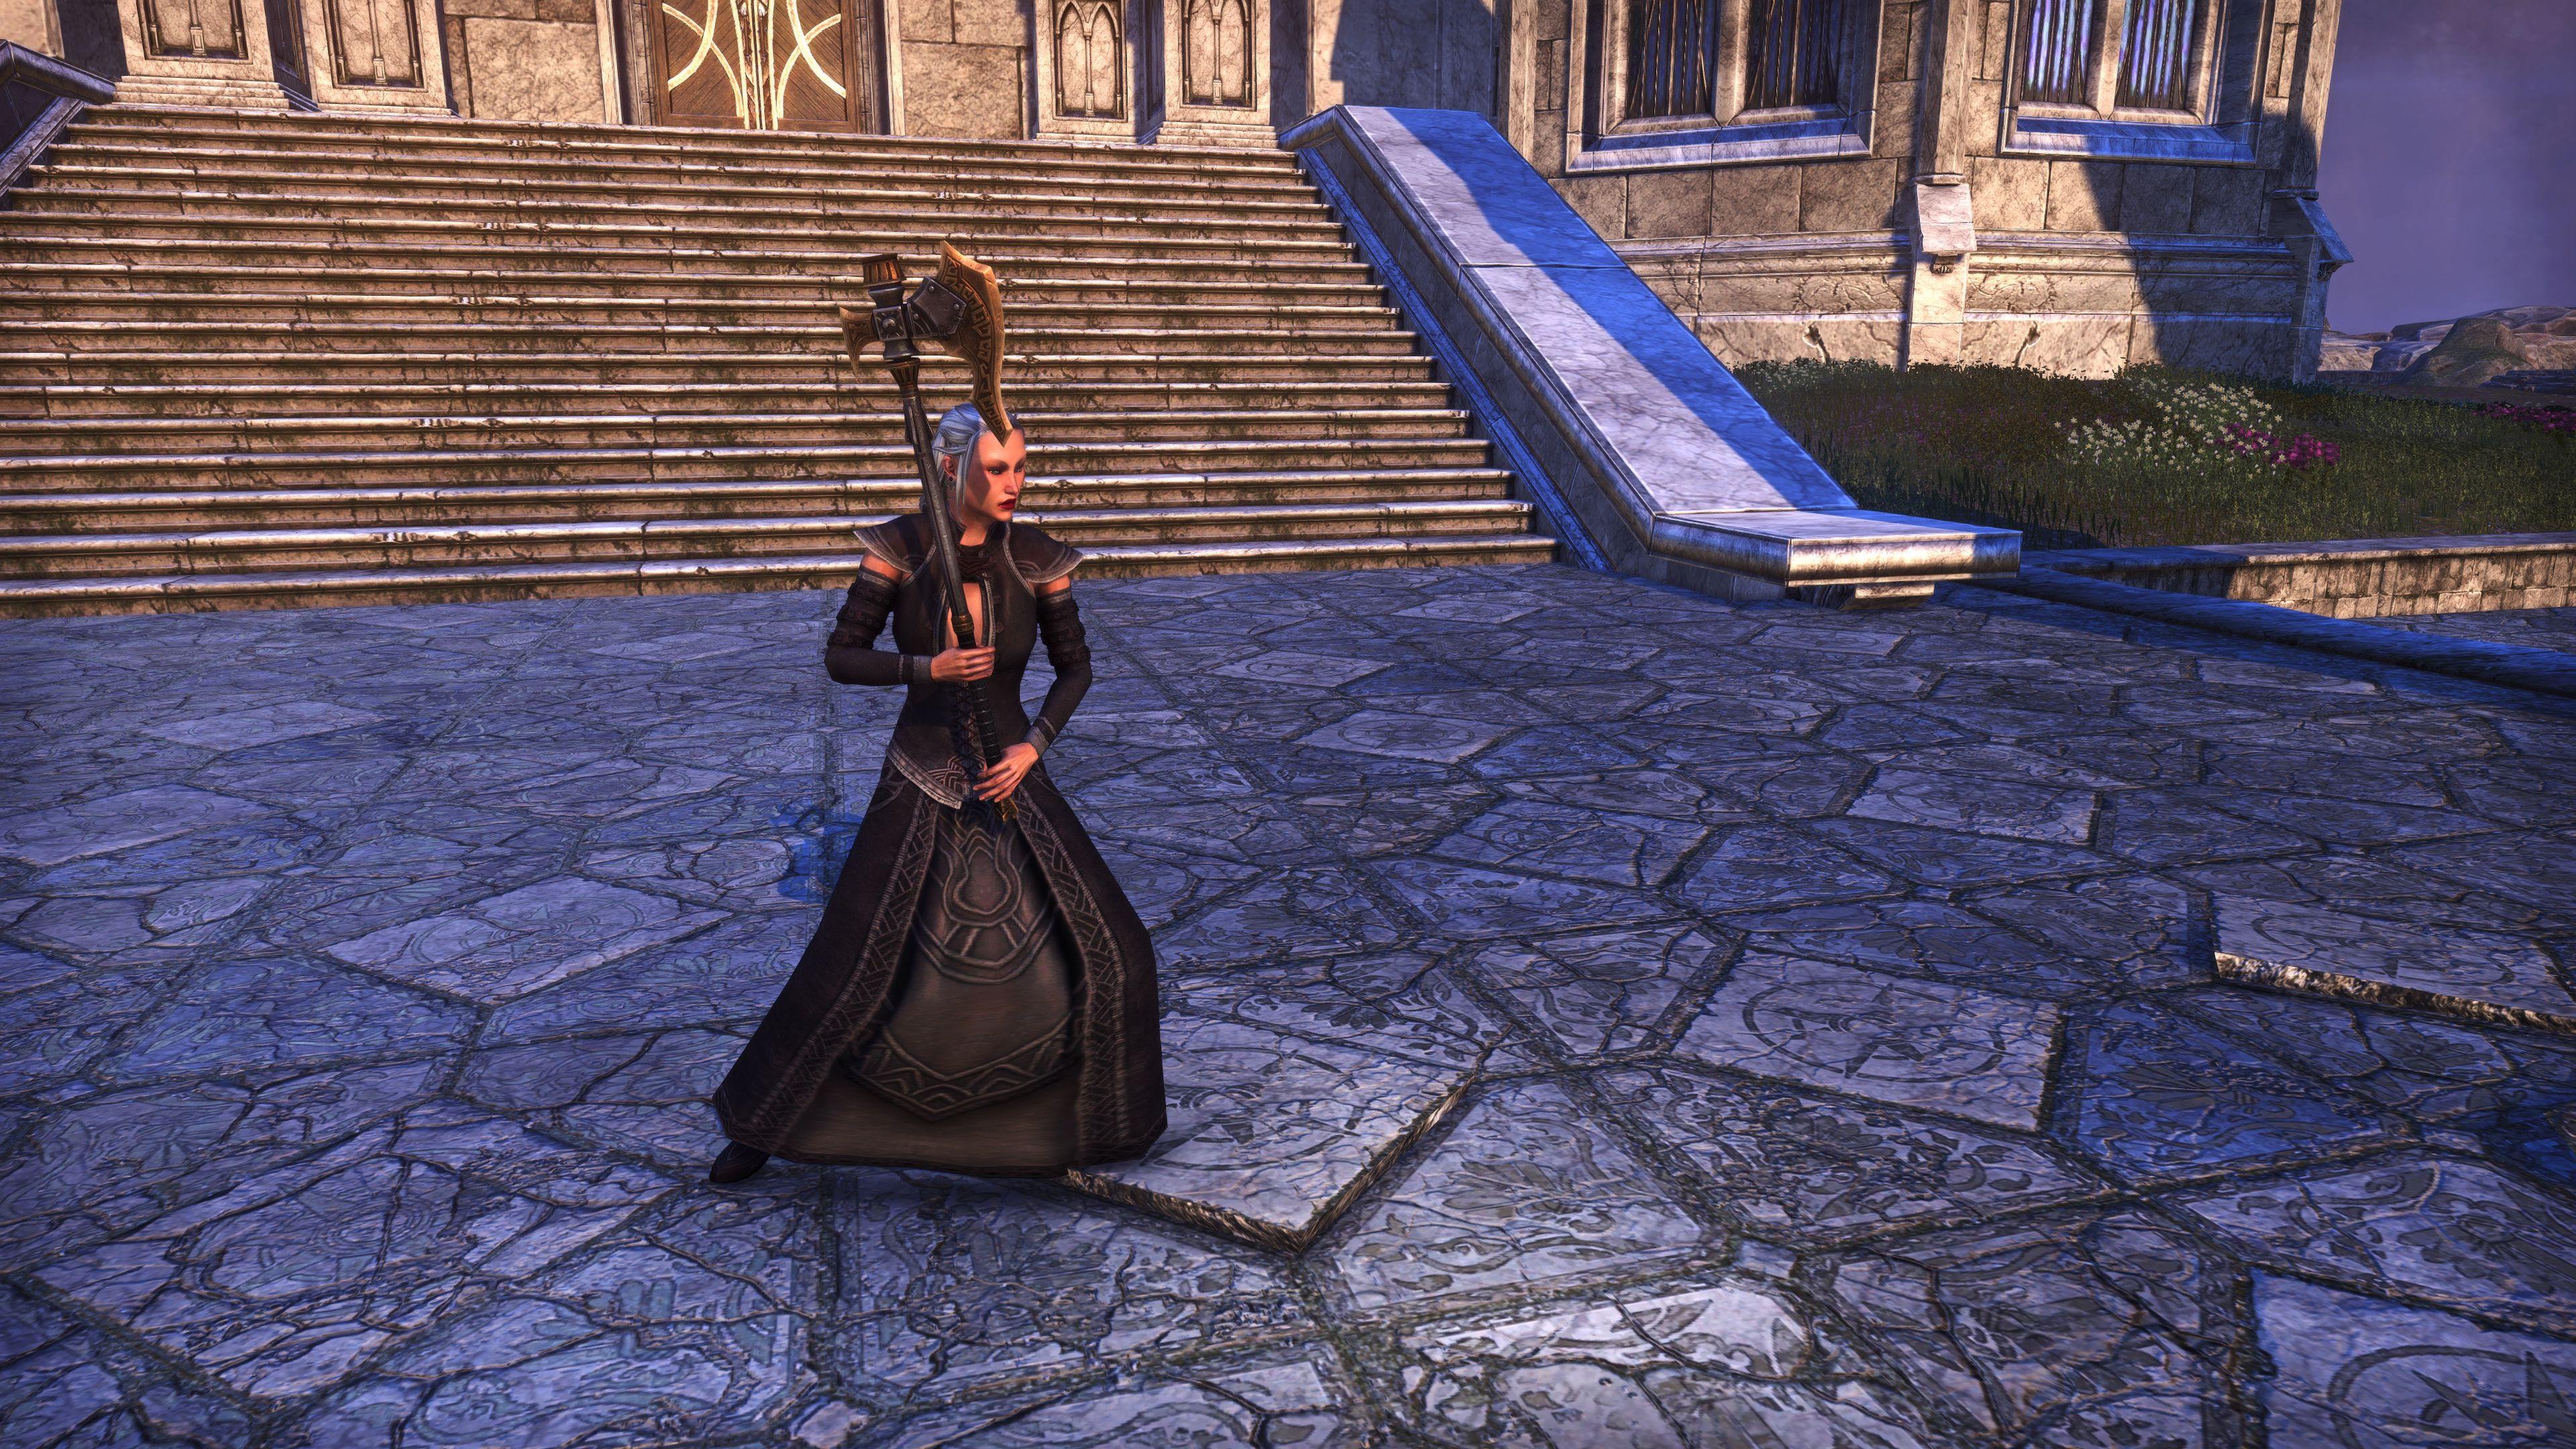 Dwarven Remnant Battle Axe (Weapon Styles > Two-Handed), Psijic Vault Crate, The Elder Scrolls Online